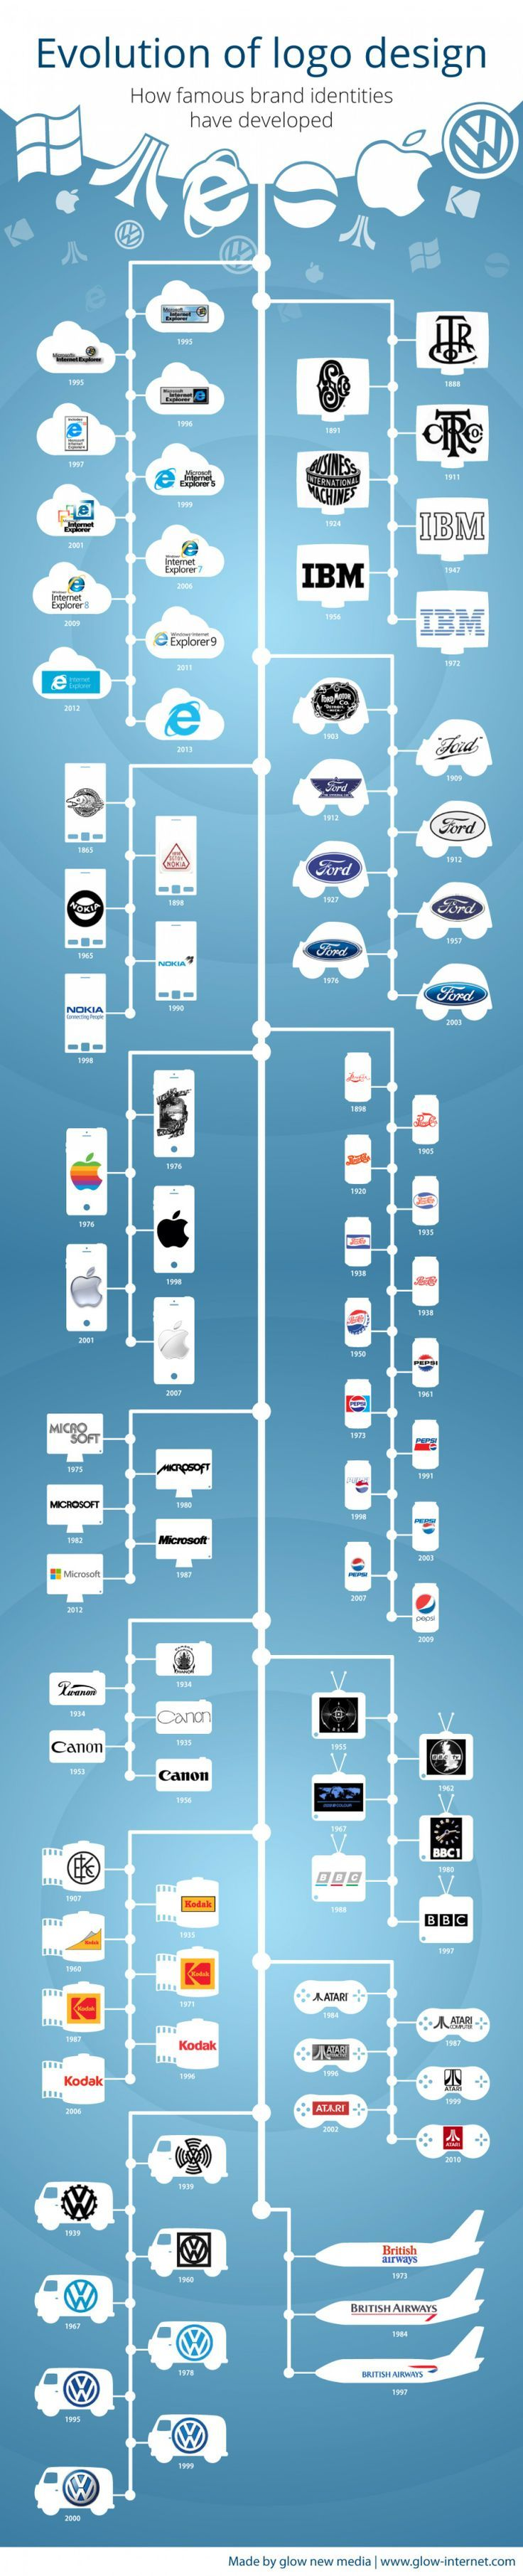 Infographic: The evolution of logo design